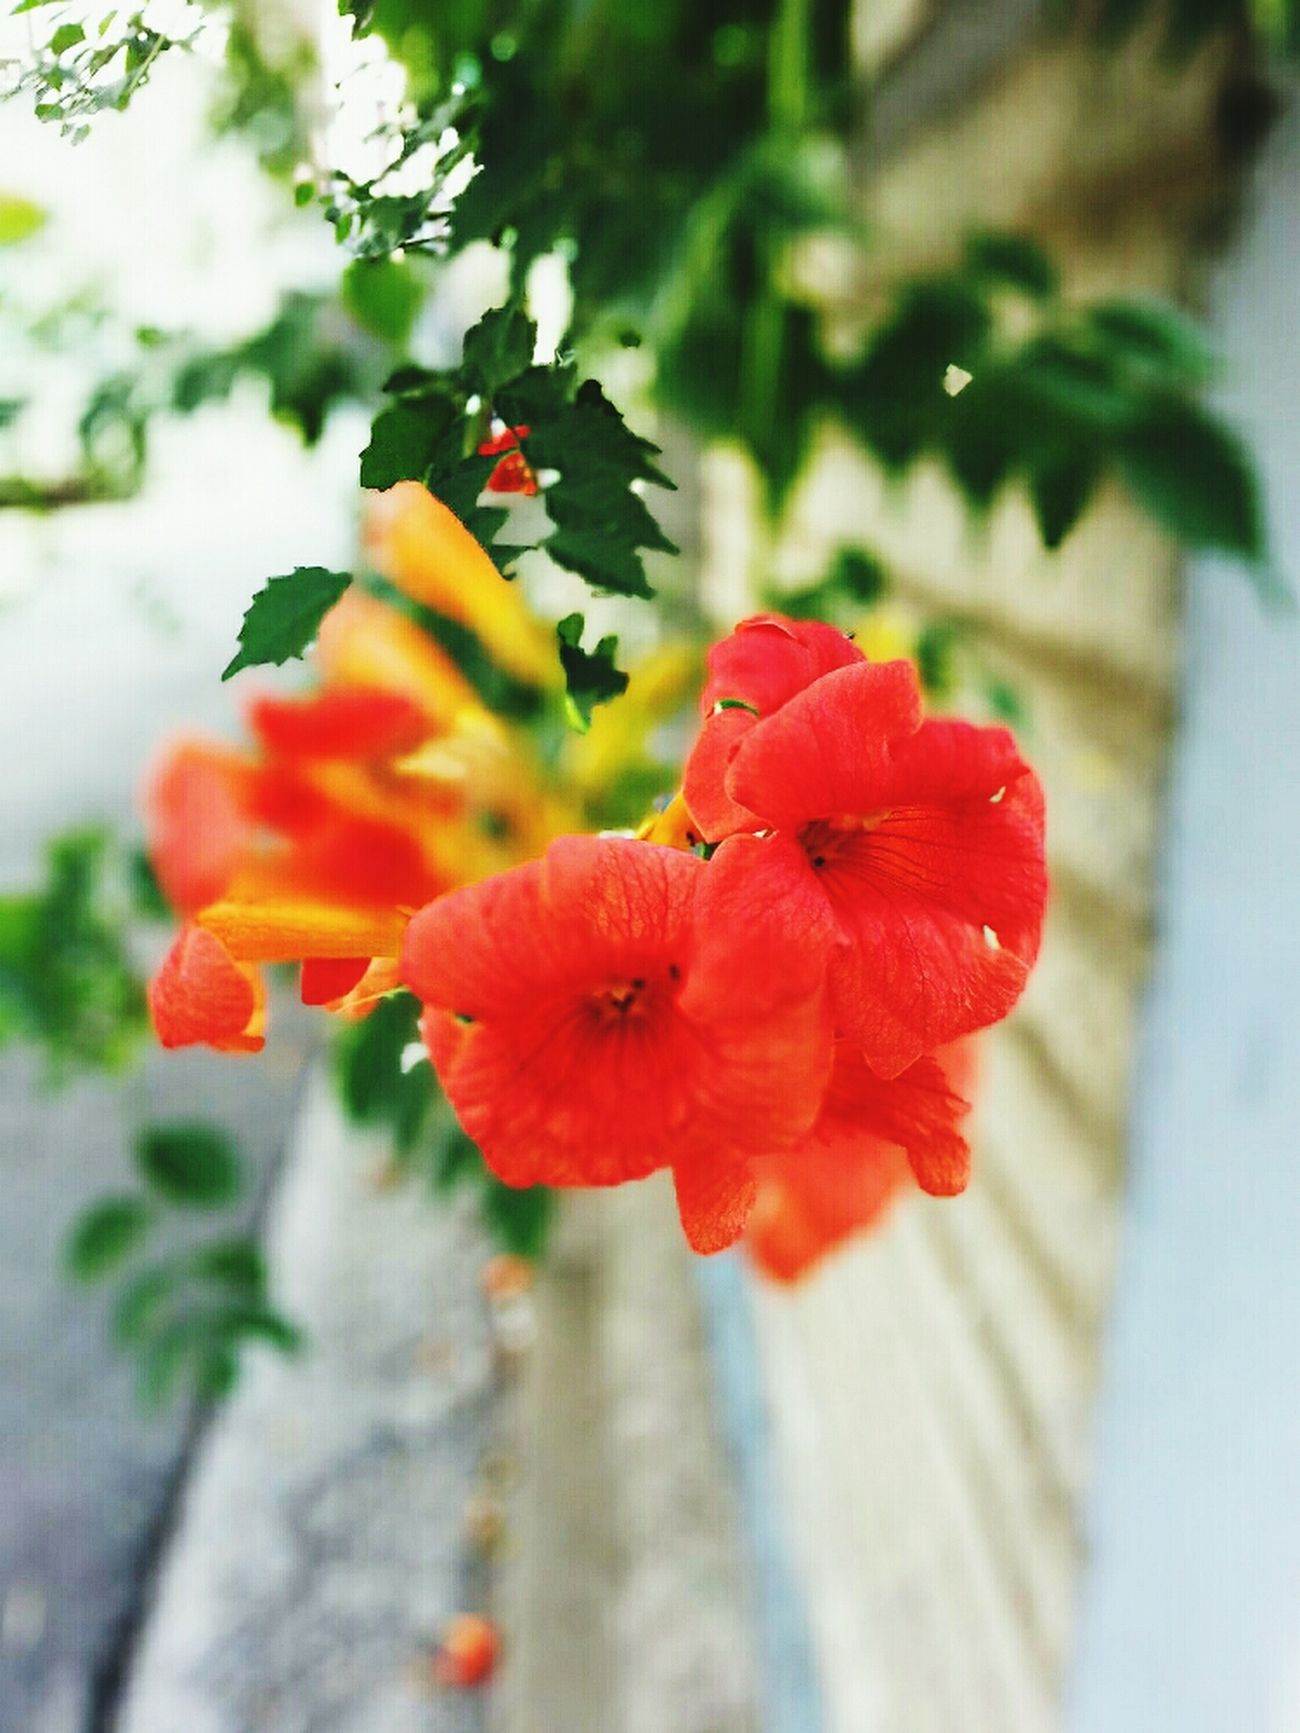 Morning Gloy Summer Flower Good Afternoon @korea seoul gui-dong / apple ipad2